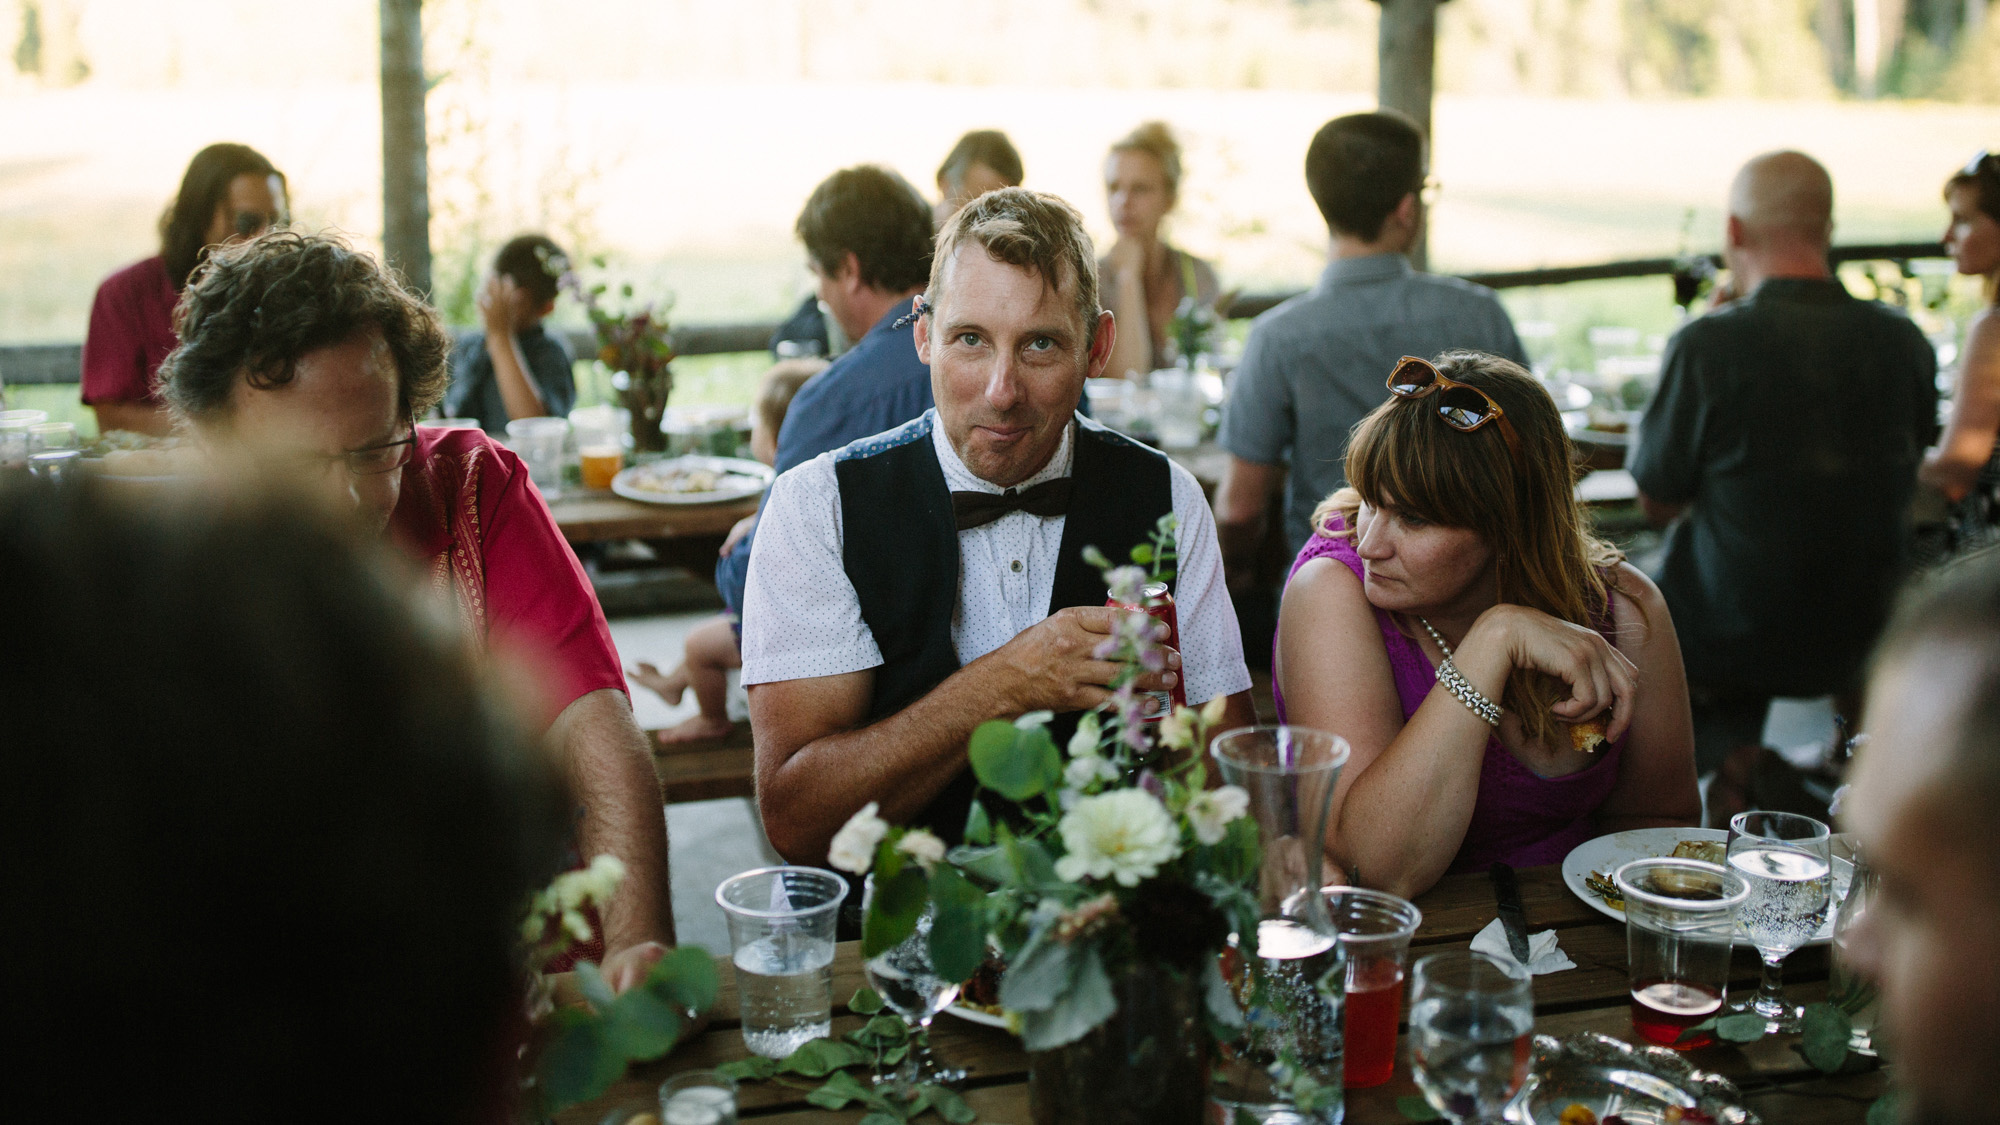 Montana_Wedding_Photos_alec_vanderboom-0122.jpg